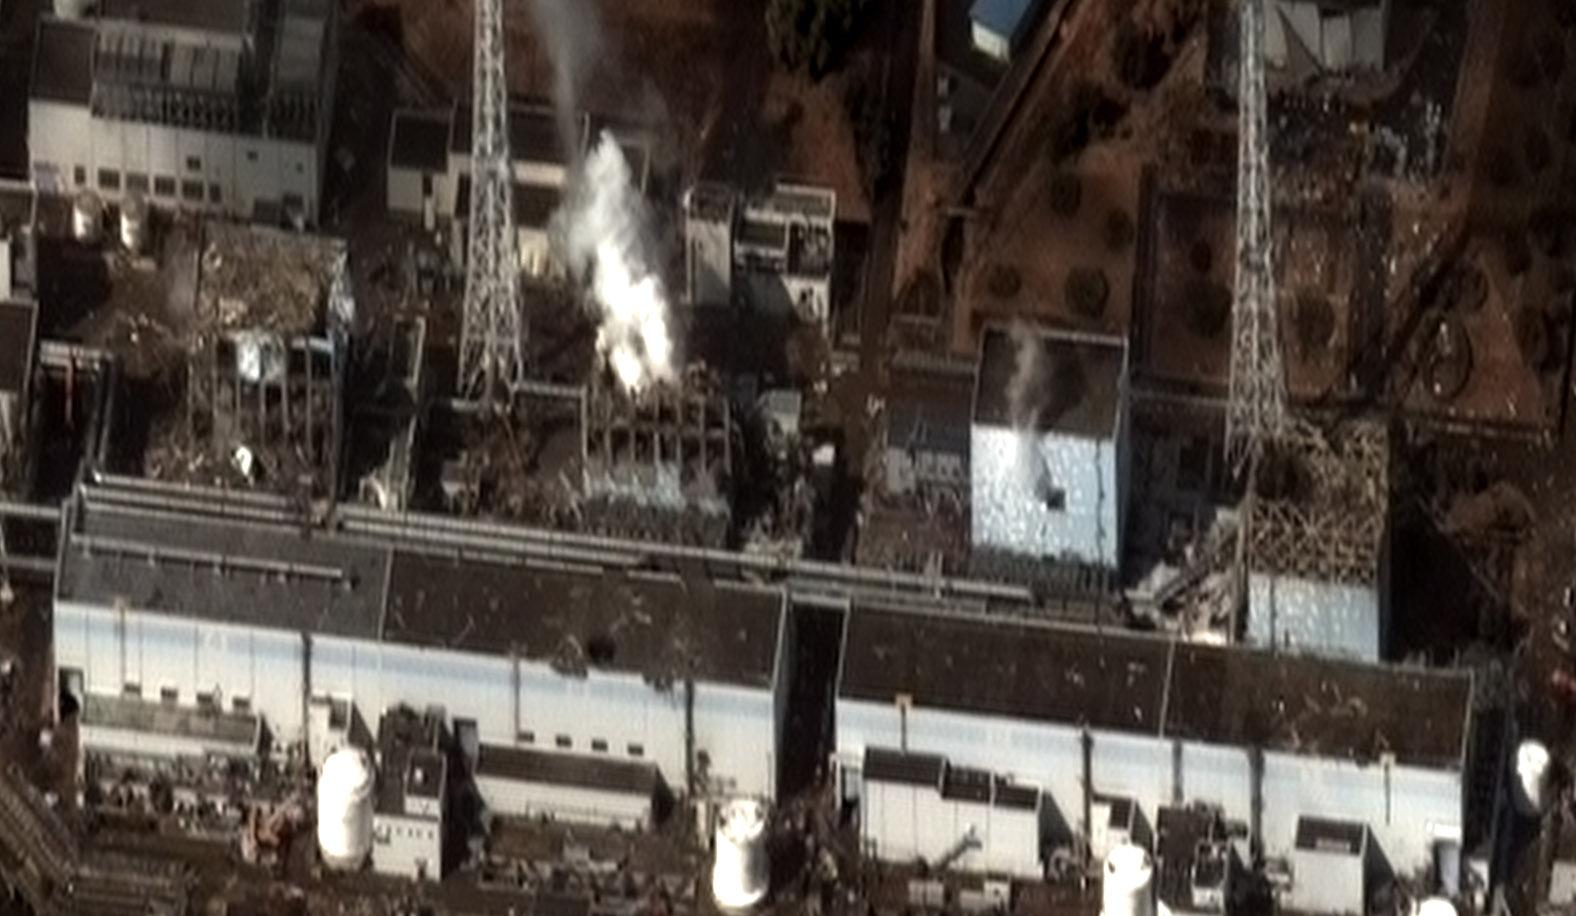 Earthquake and Tsunami damage-Dai Ichi Power Plant, Japan